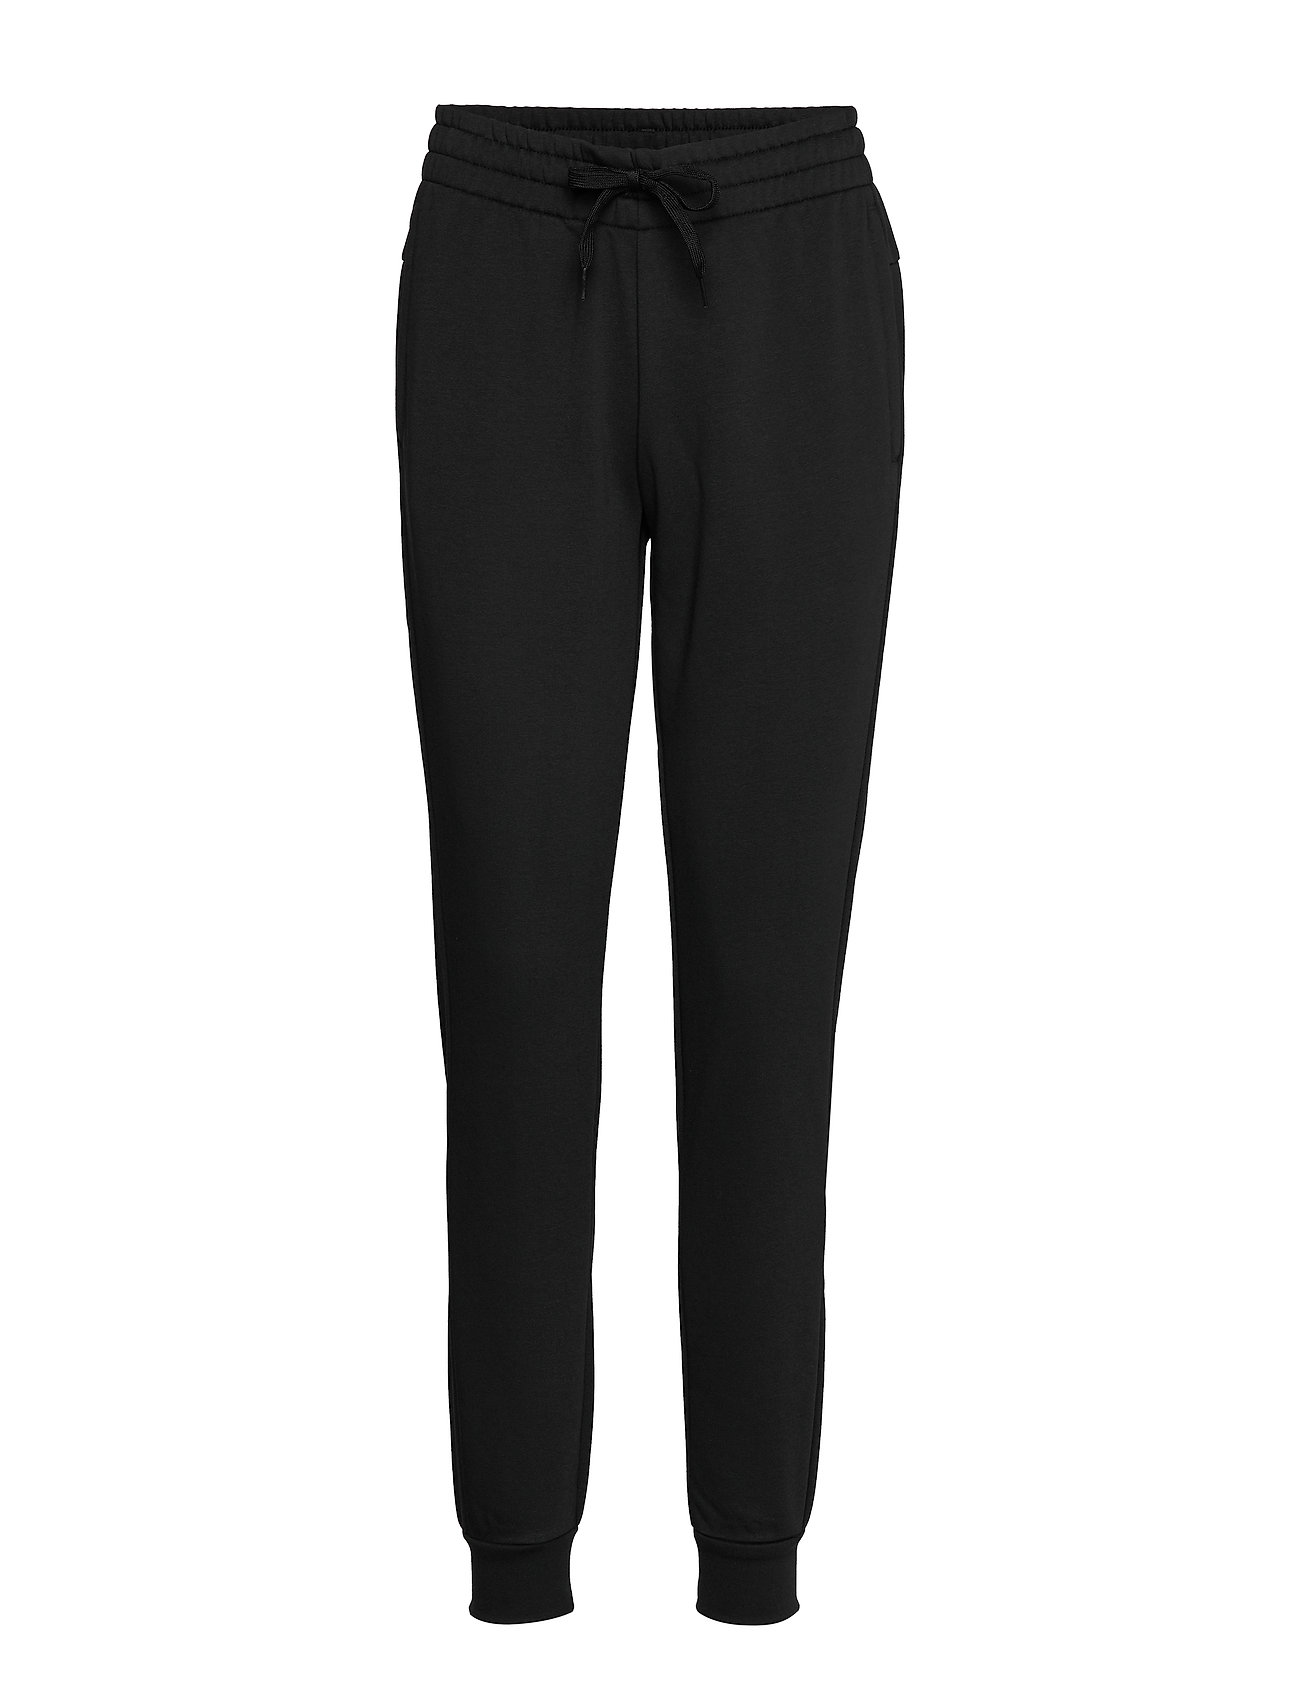 adidas Performance W E LIN PANT - BLACK/WHITE